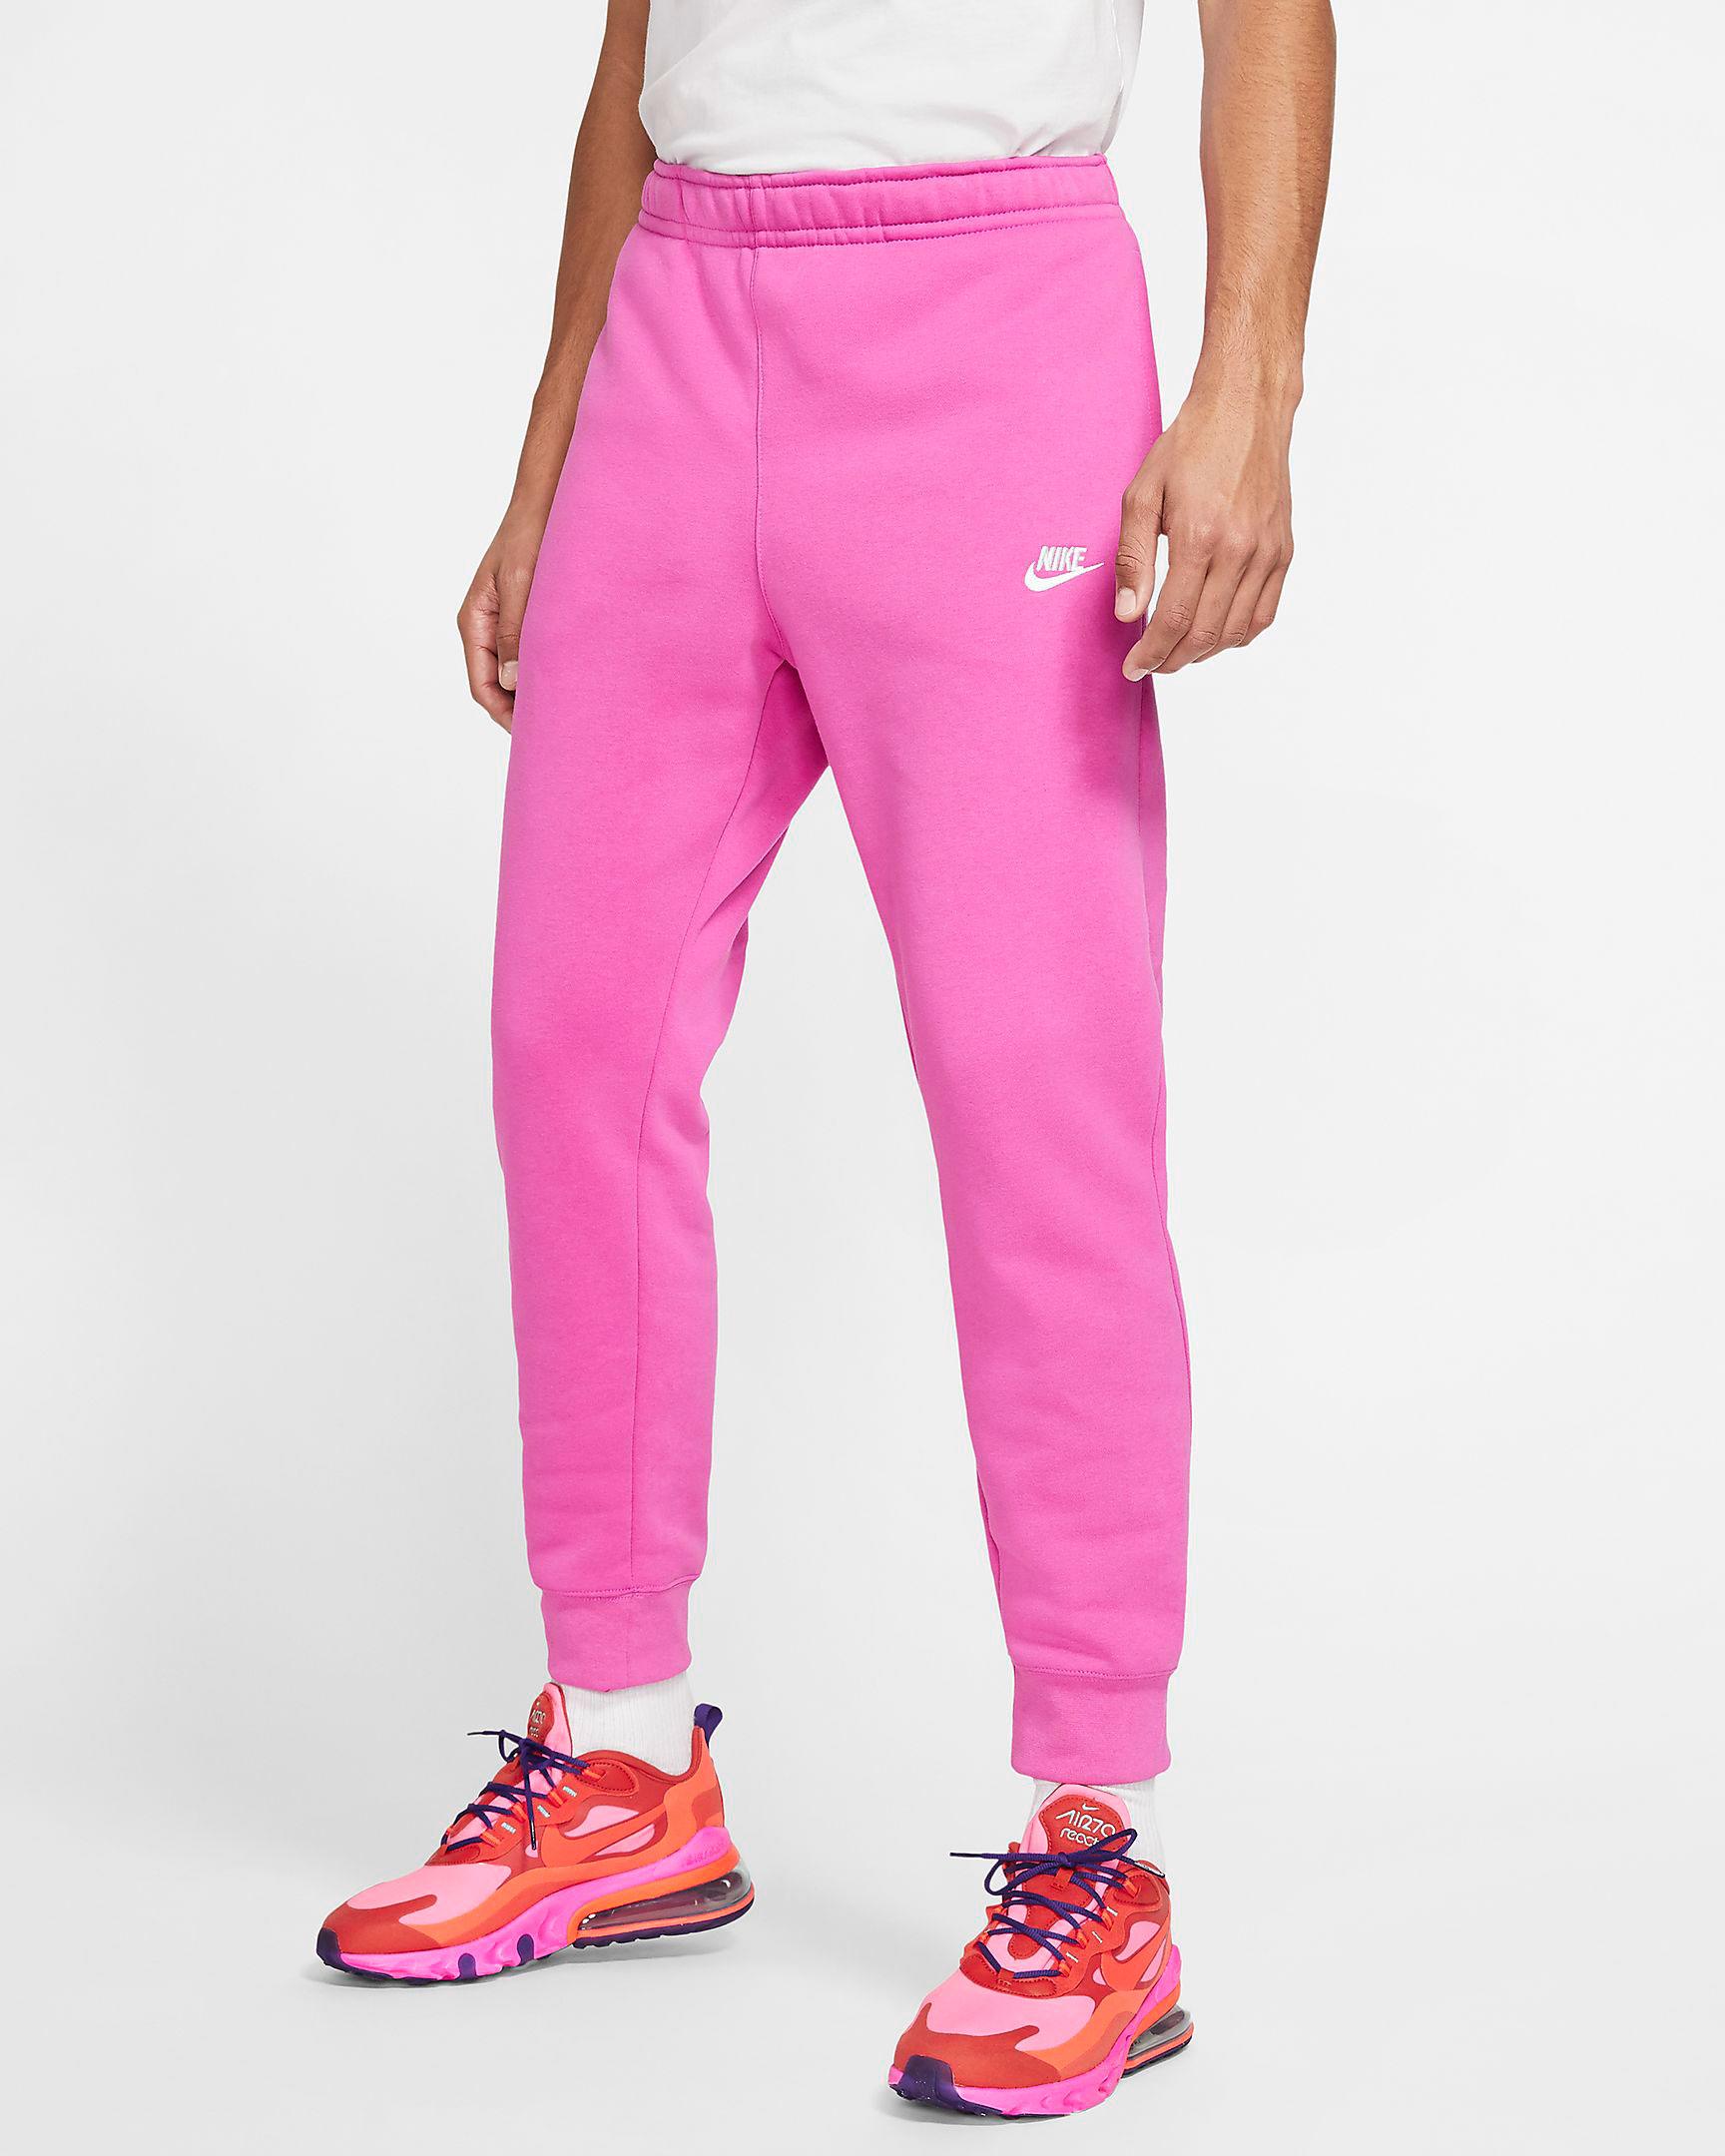 nike-sportswear-pink-fuschia-jogger-pants